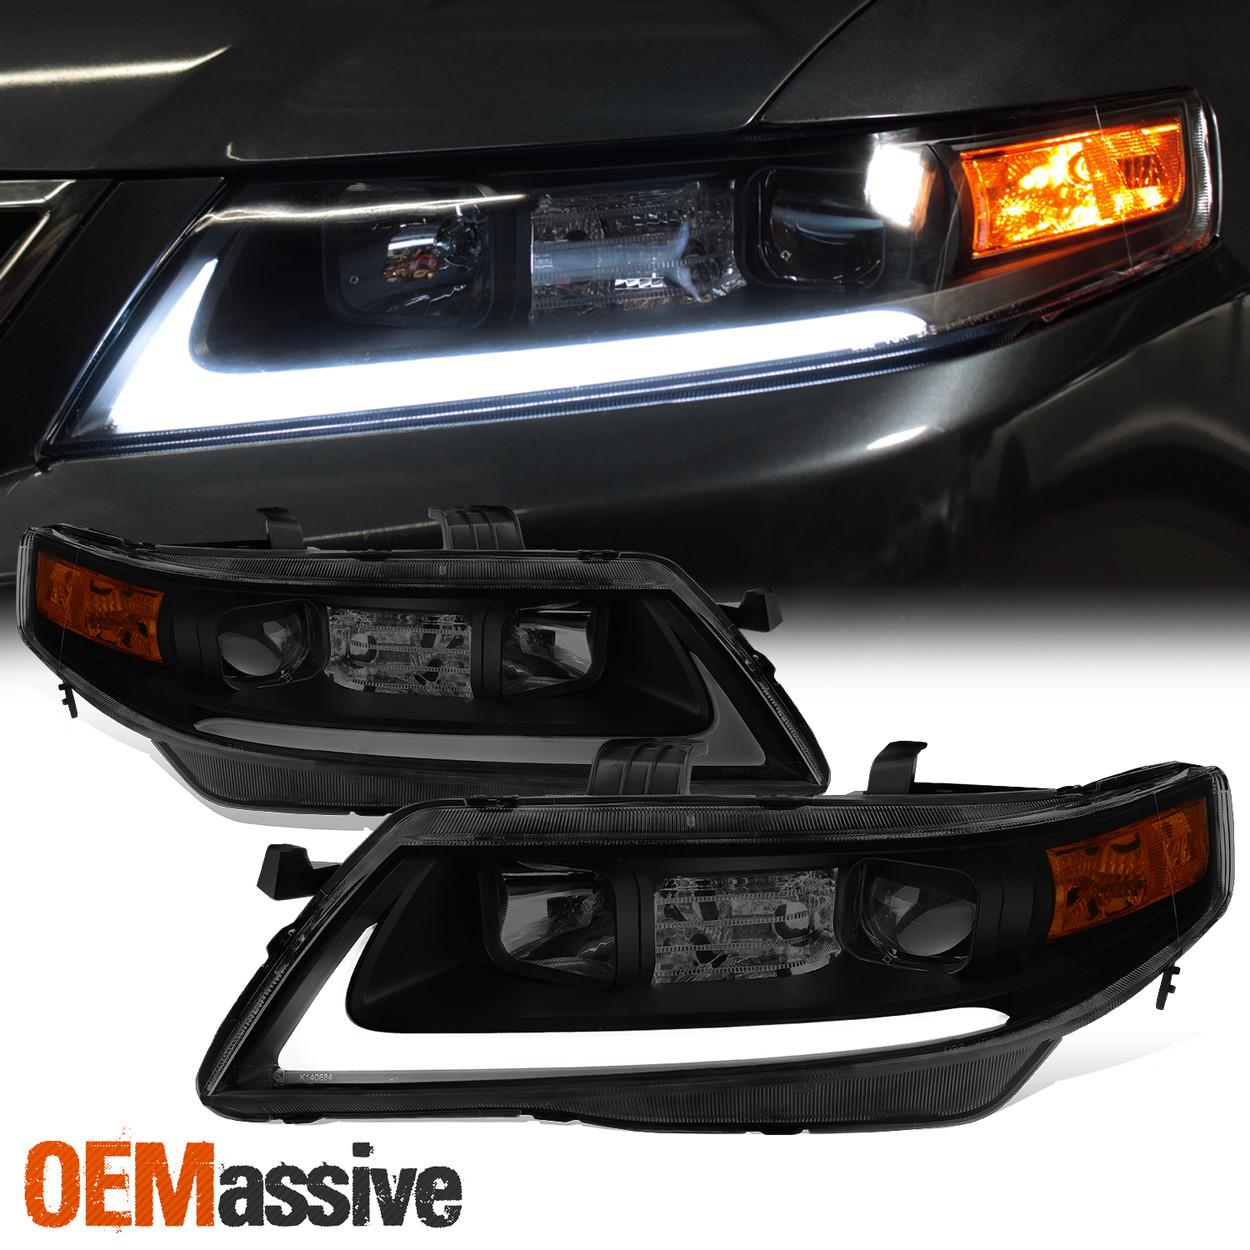 Black Smoke 2004 2005 2006 2007 2008 Acura Tsx Led Bar Projector Headlights Oemassive